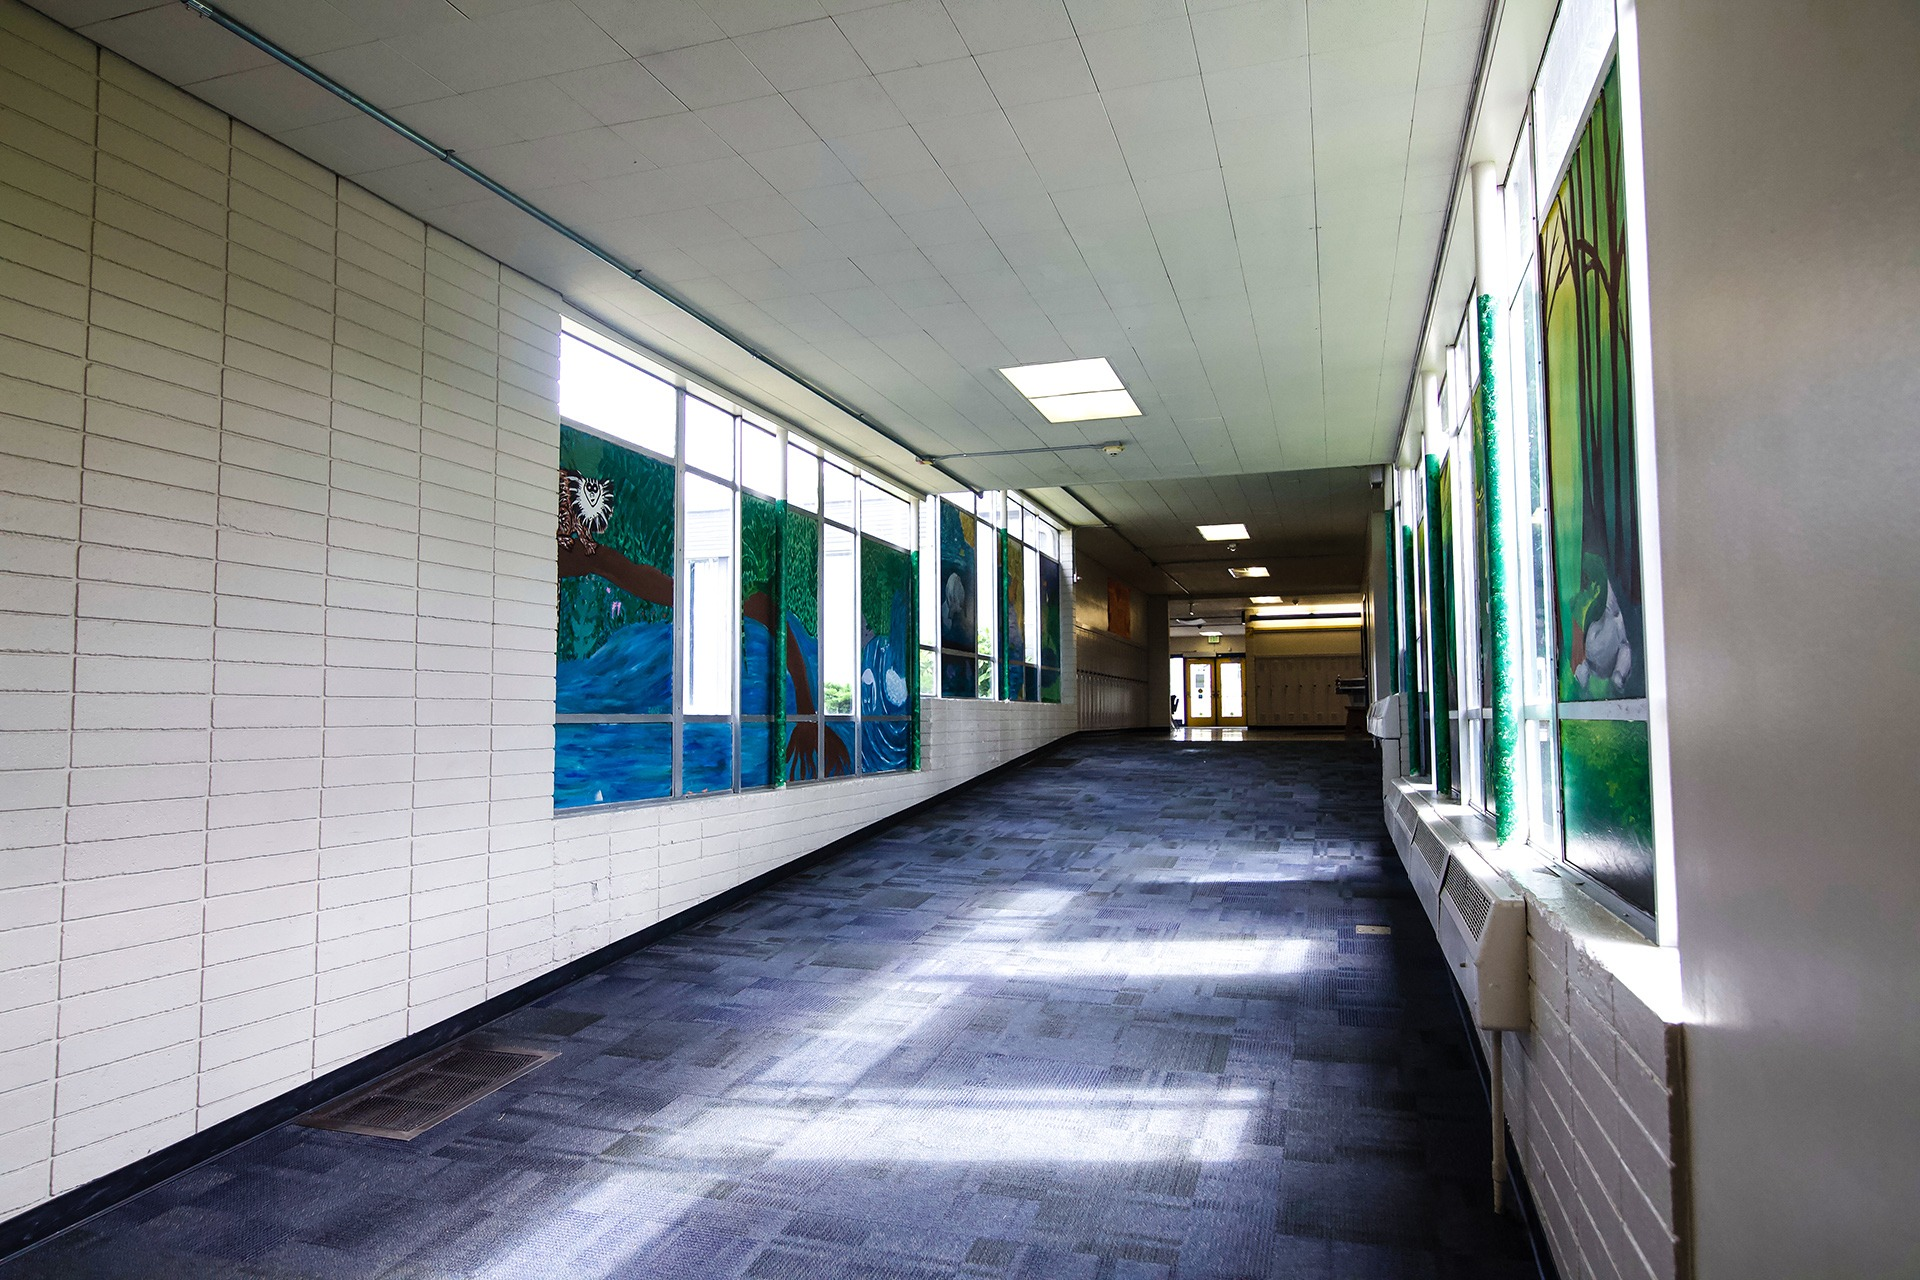 Ashland exterior interior before (7 of 12)